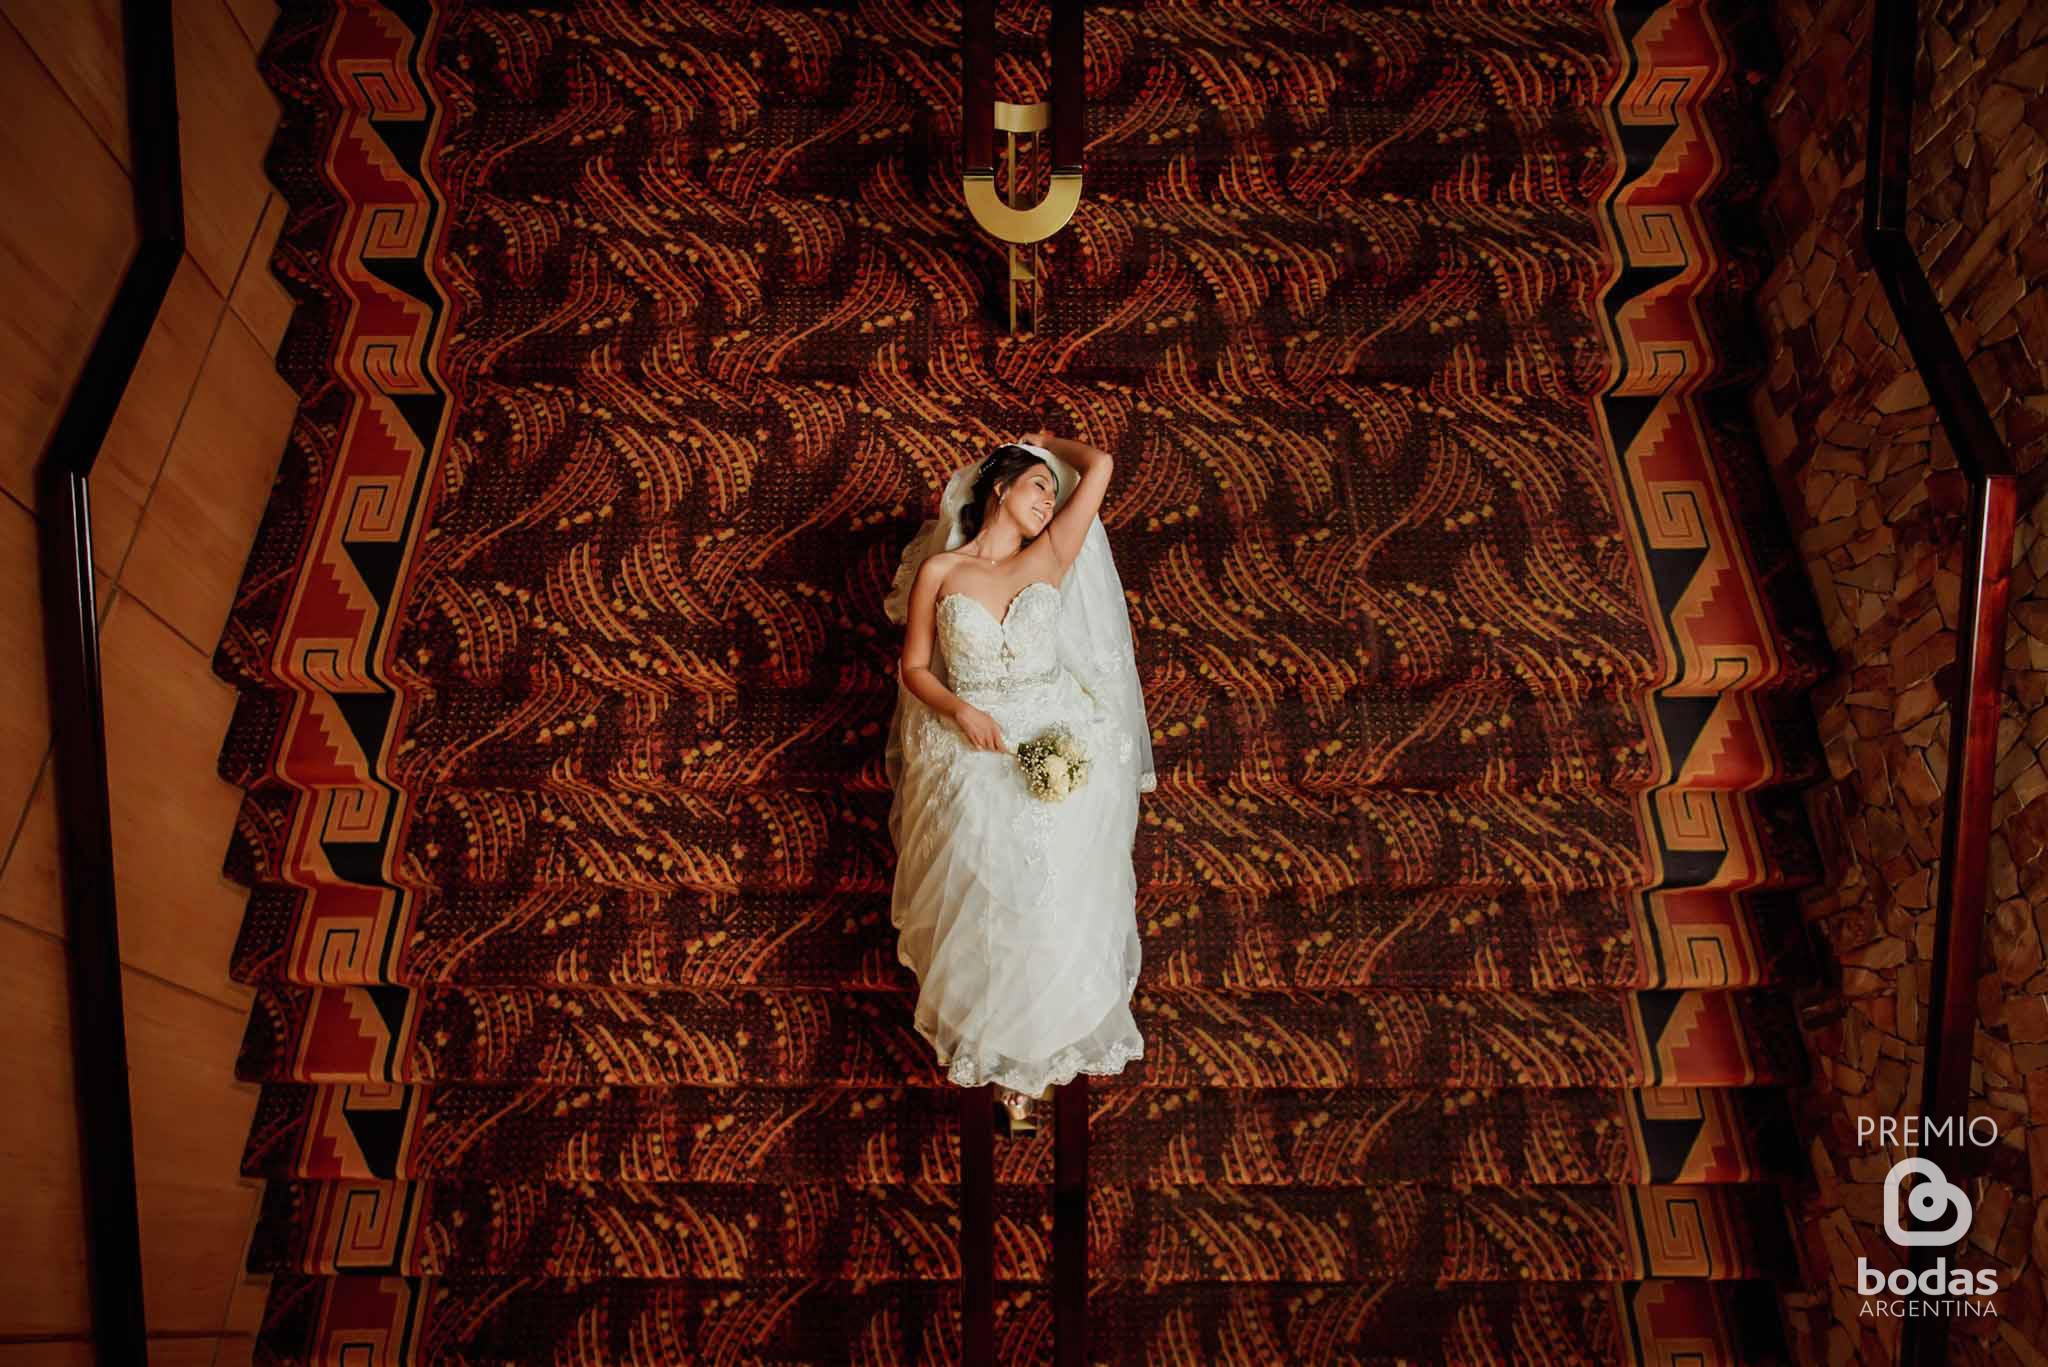 premio bodas argentina - phmatiasfernandez - matias fernandez